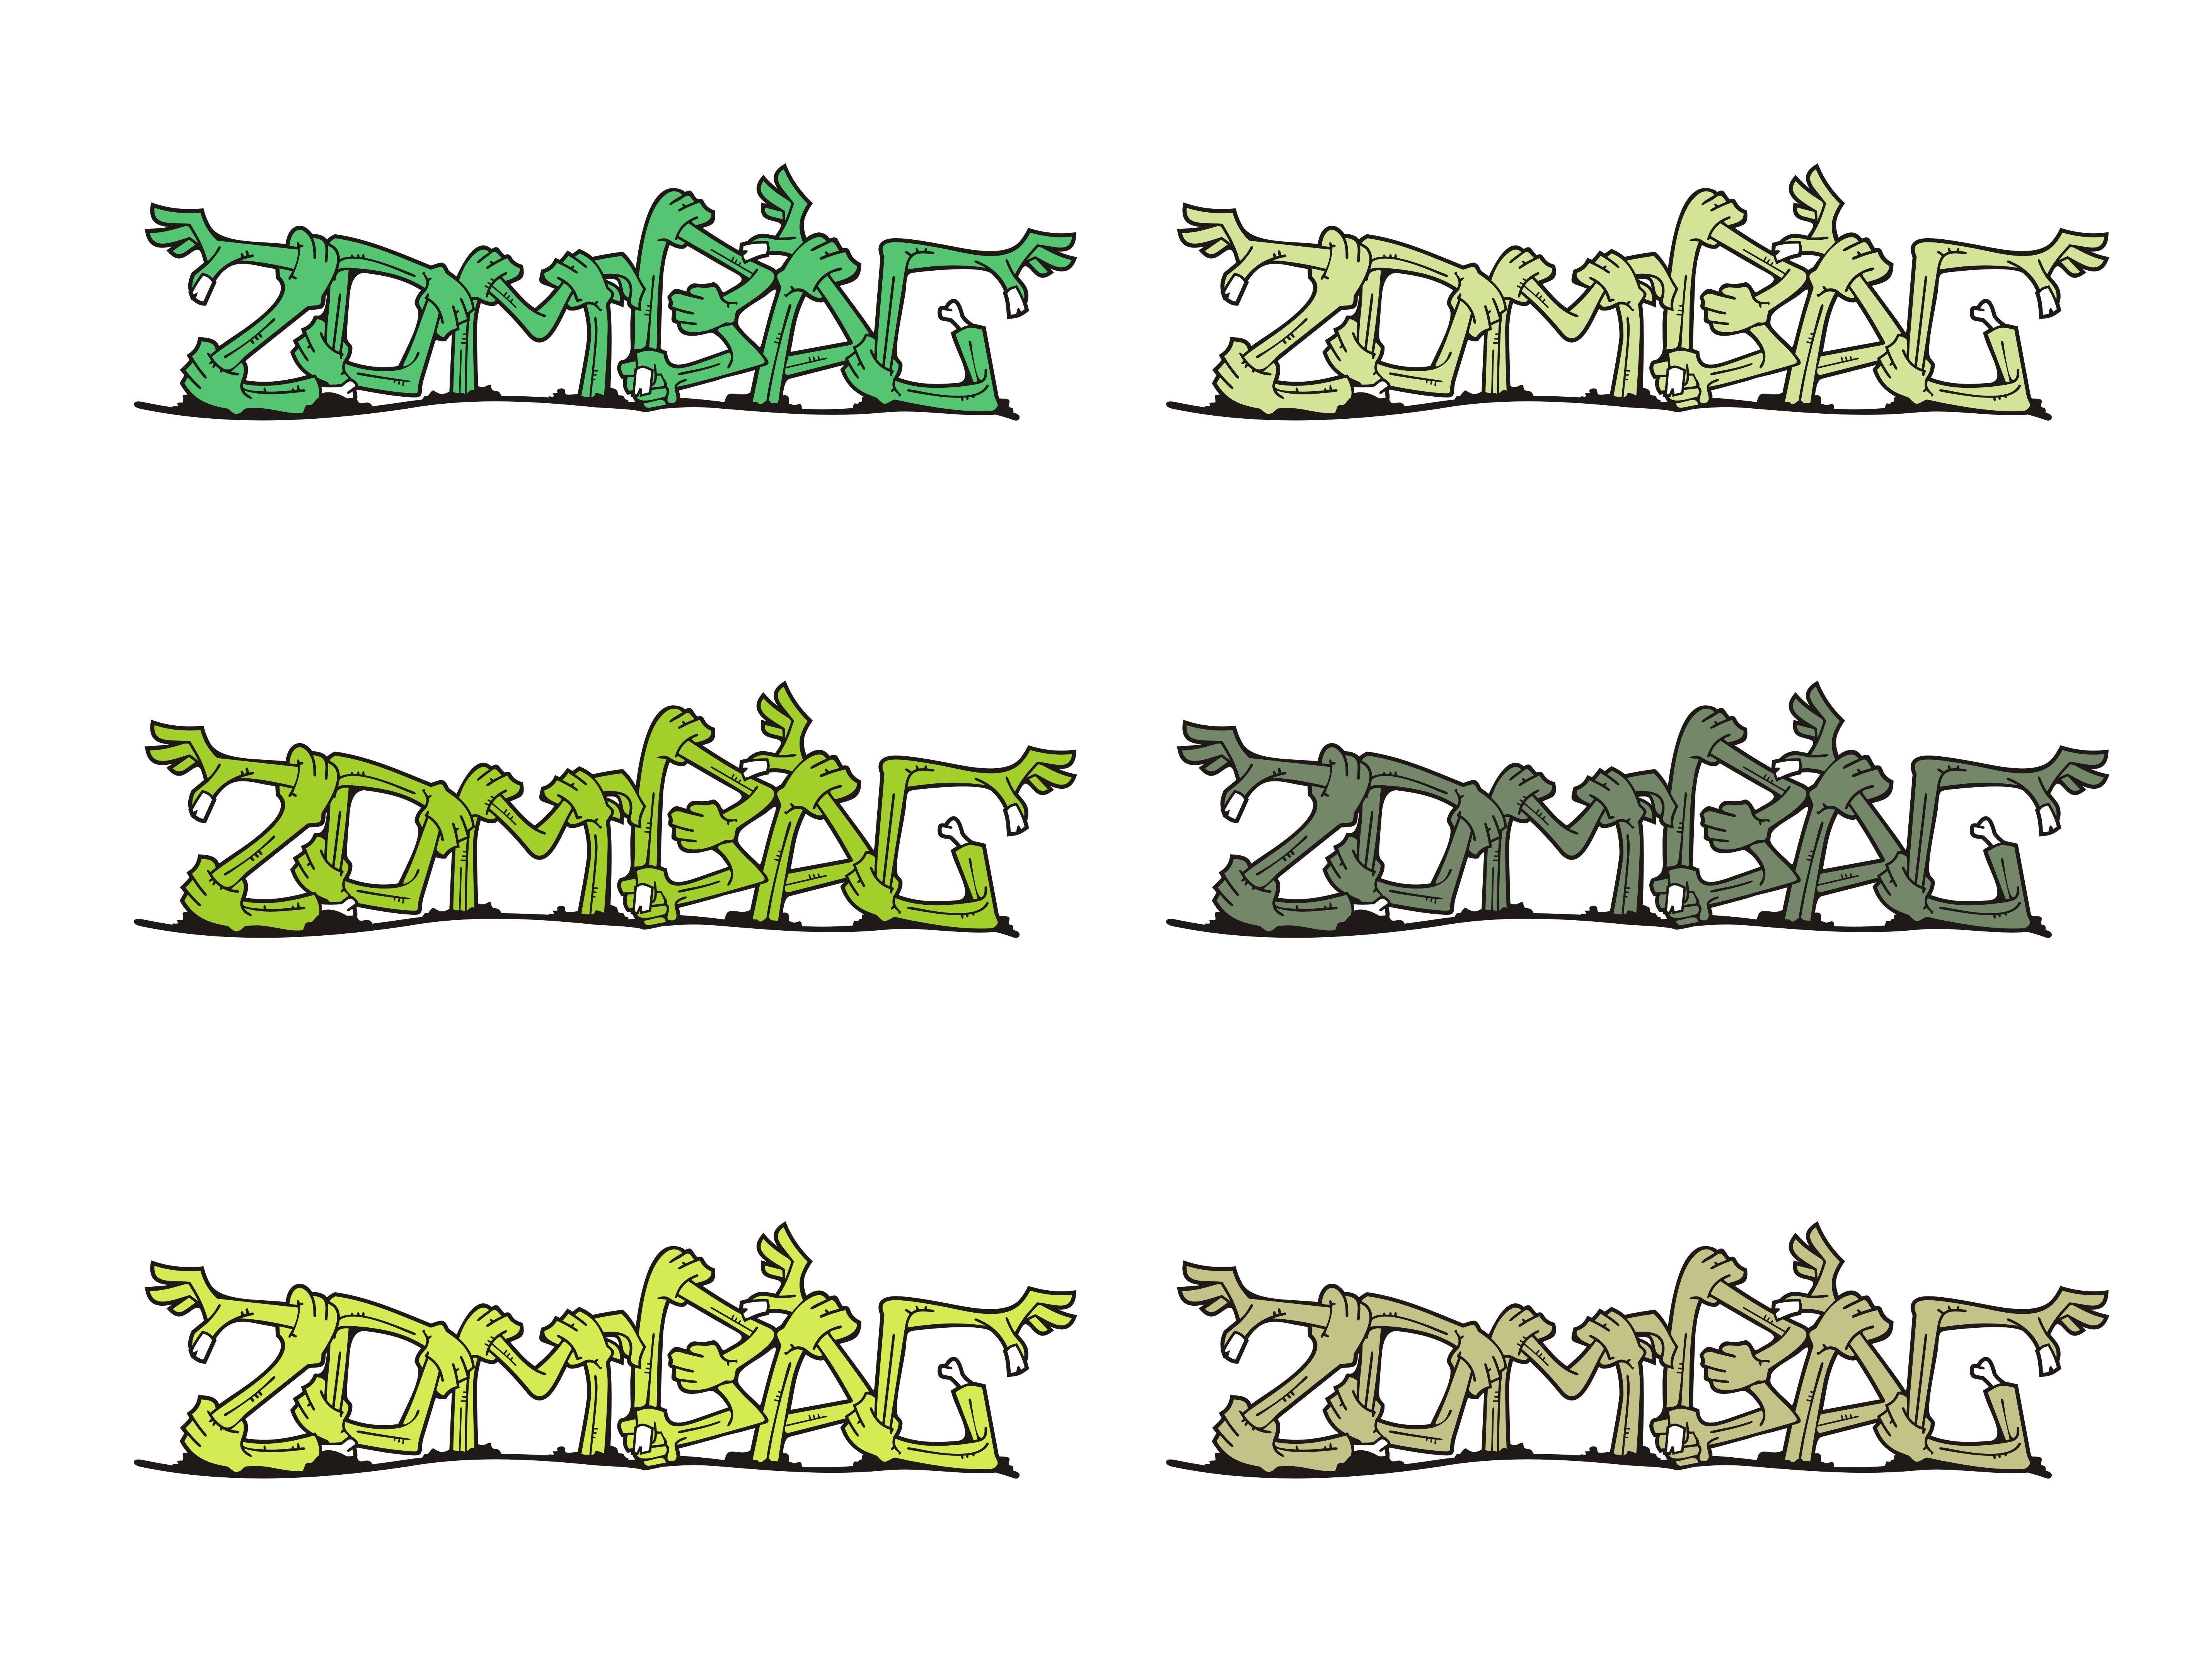 Zombag: Zombie Arm Font Logo